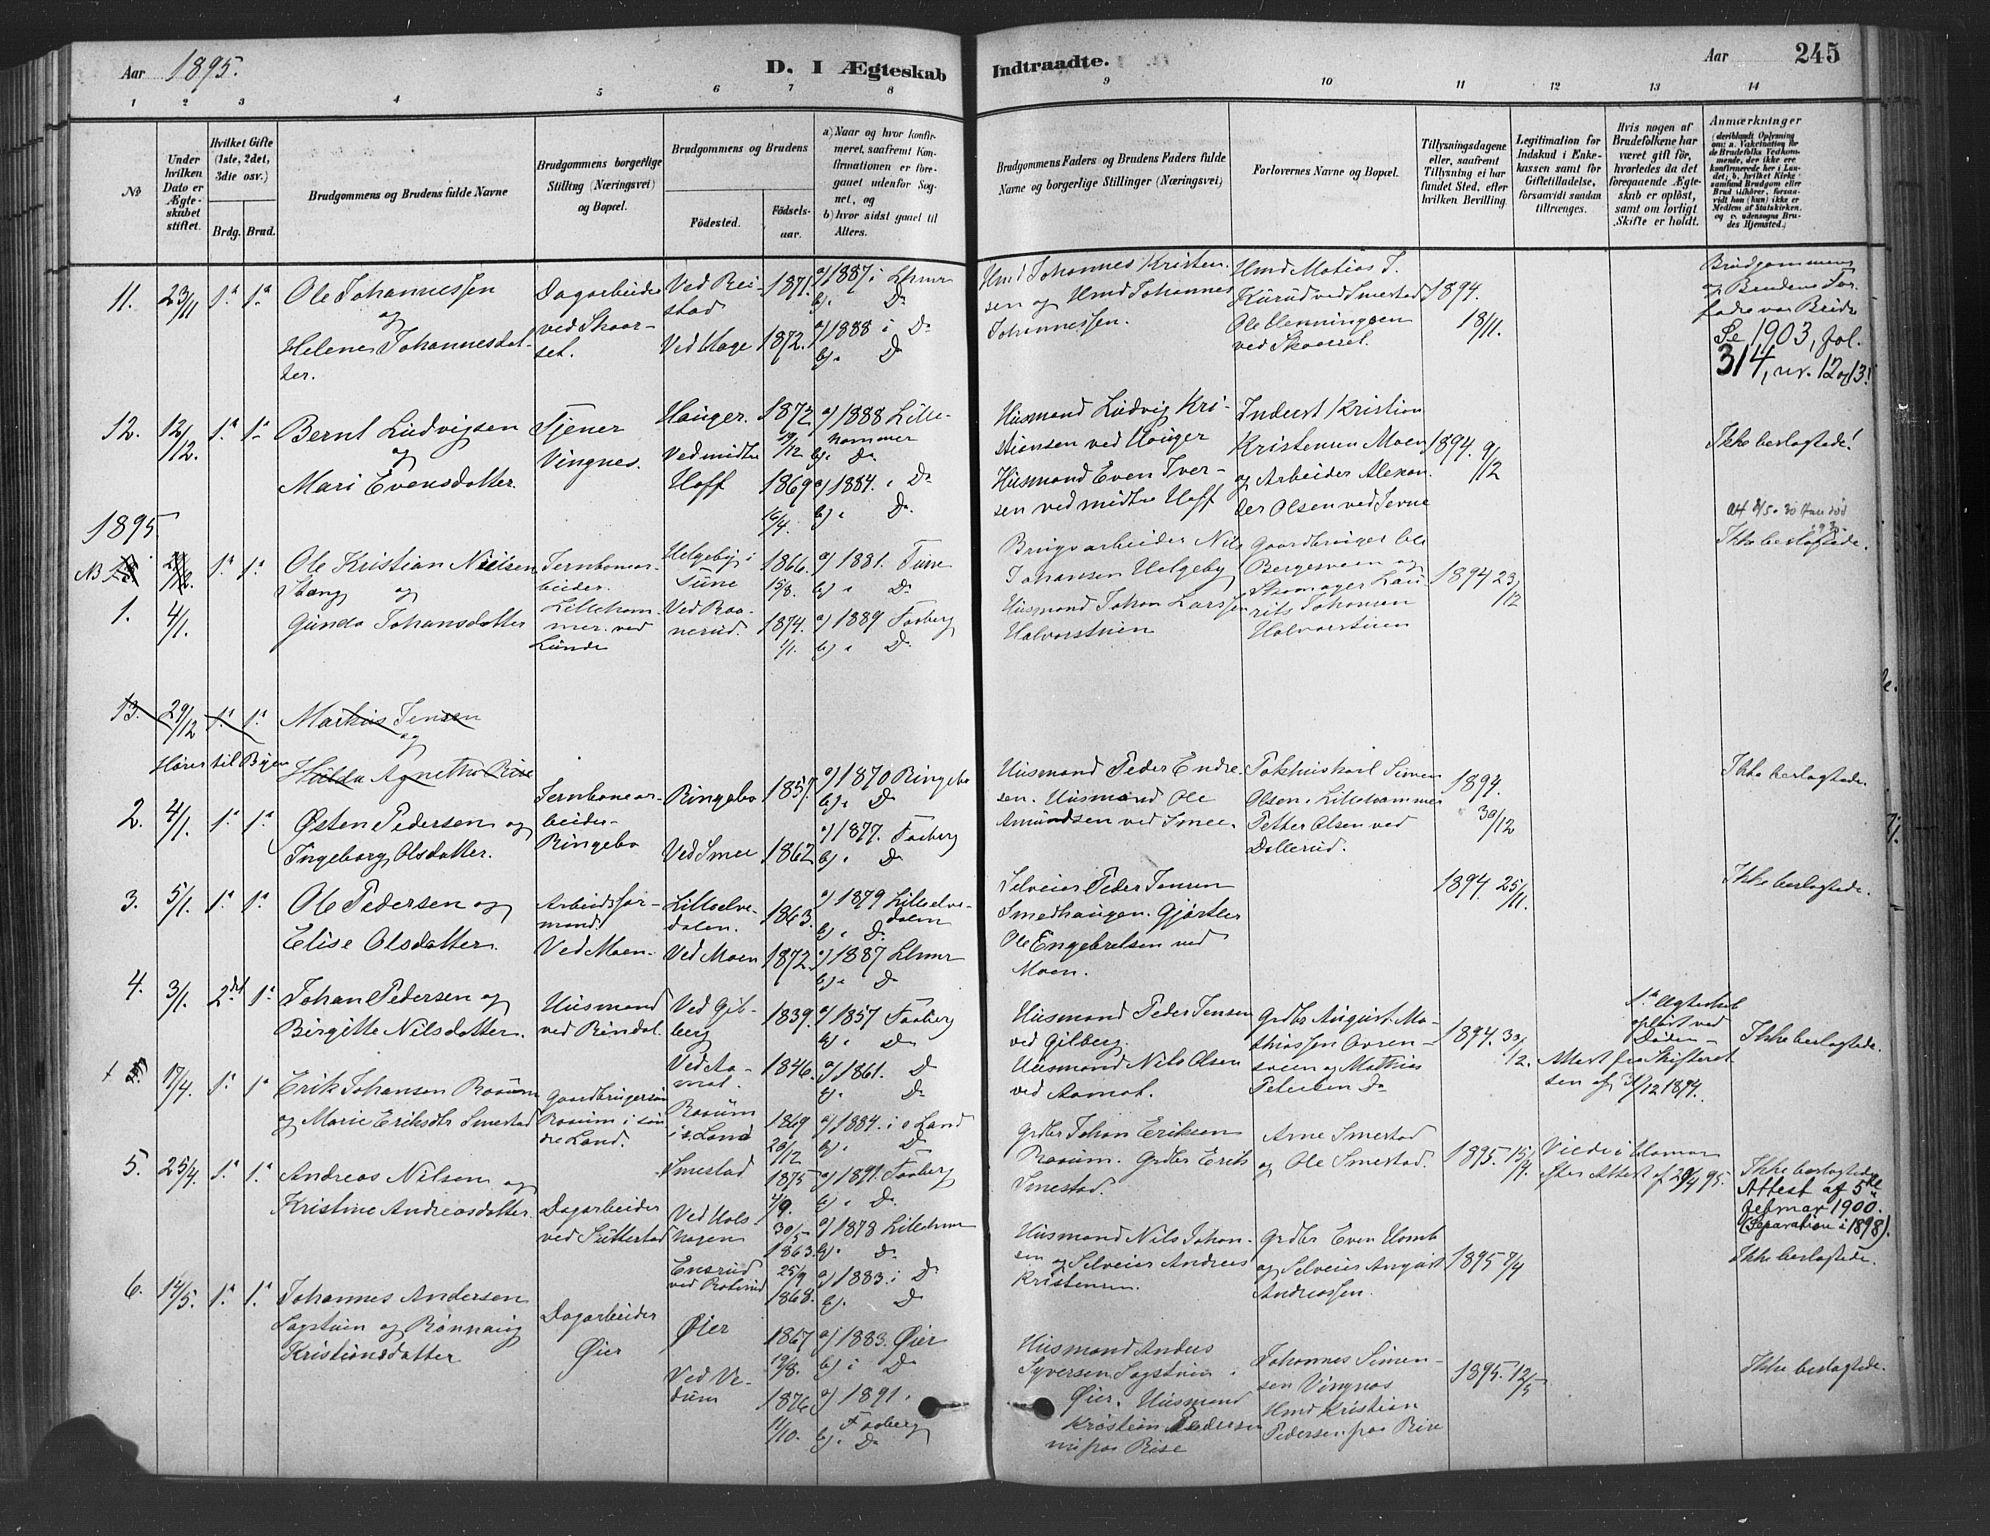 SAH, Fåberg prestekontor, Ministerialbok nr. 9, 1879-1898, s. 245